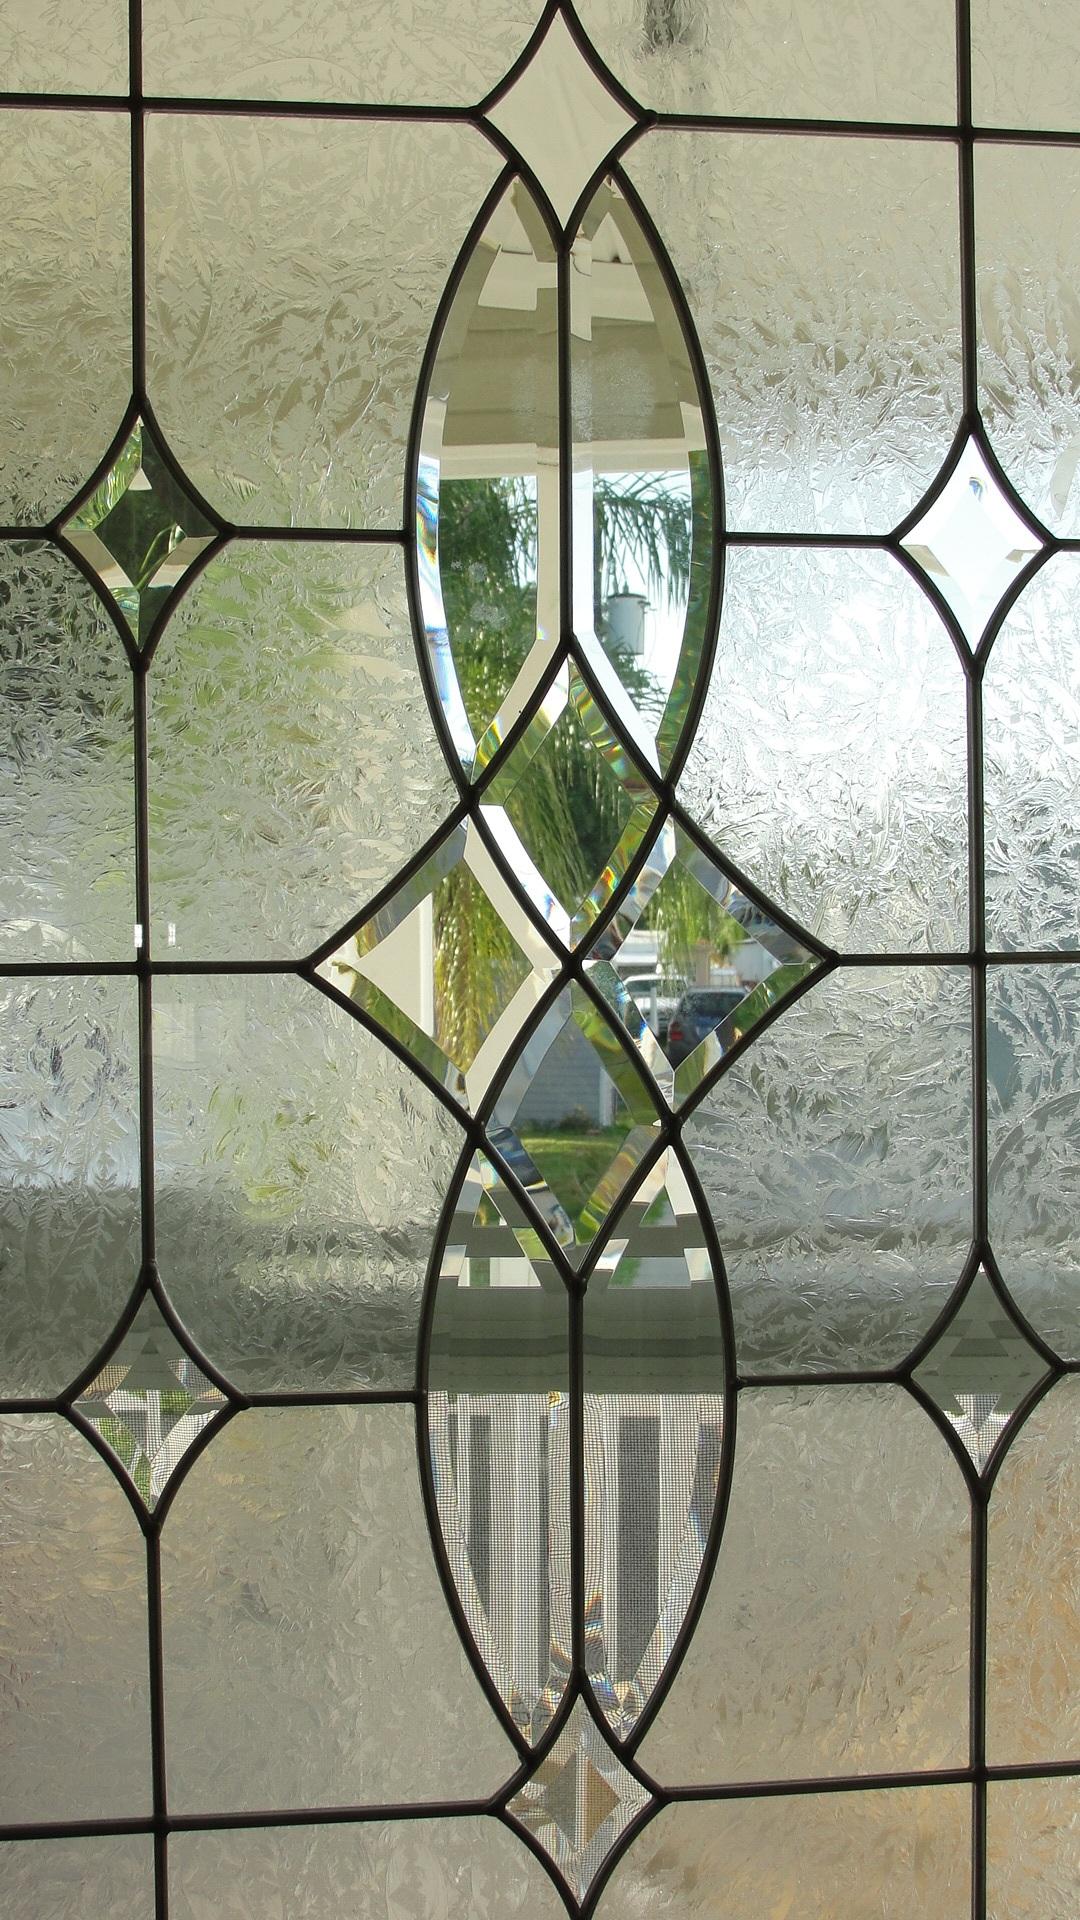 Fotos gratis : piso, interior, ventana, vaso, casa, Entrada ...